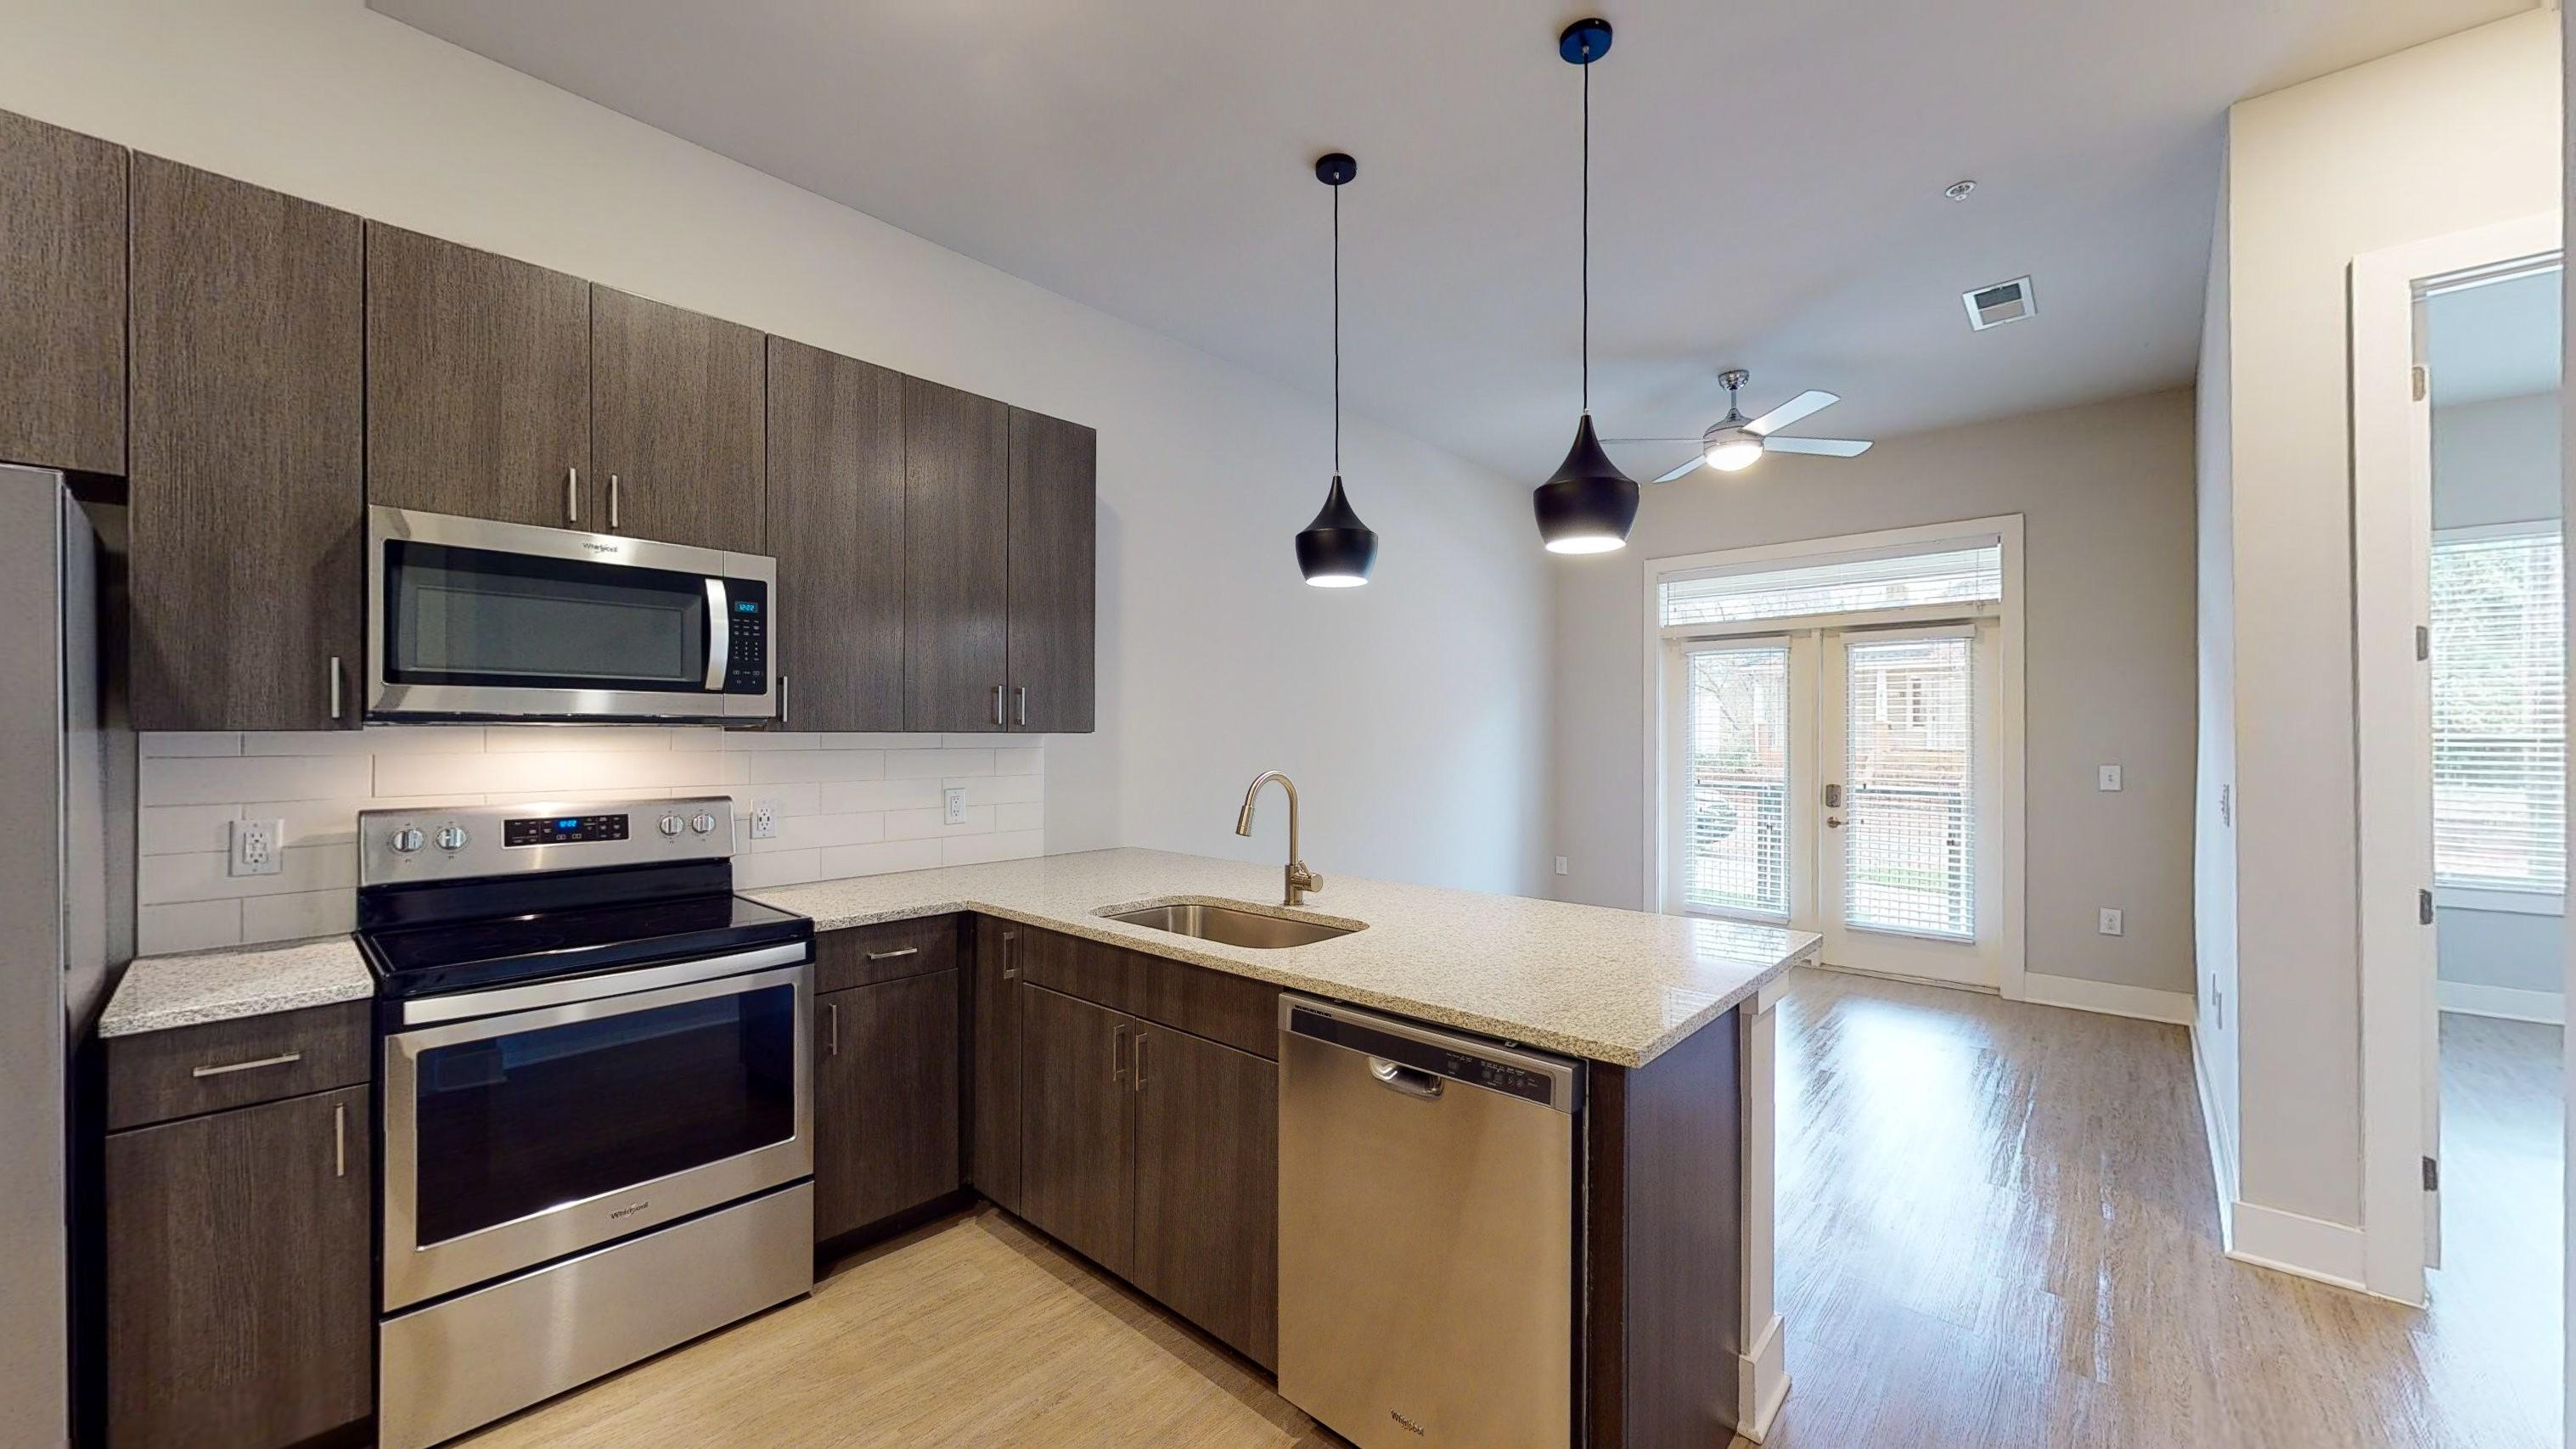 Apartments Near North Carolina Cortland NoDa for North Carolina Students in , NC